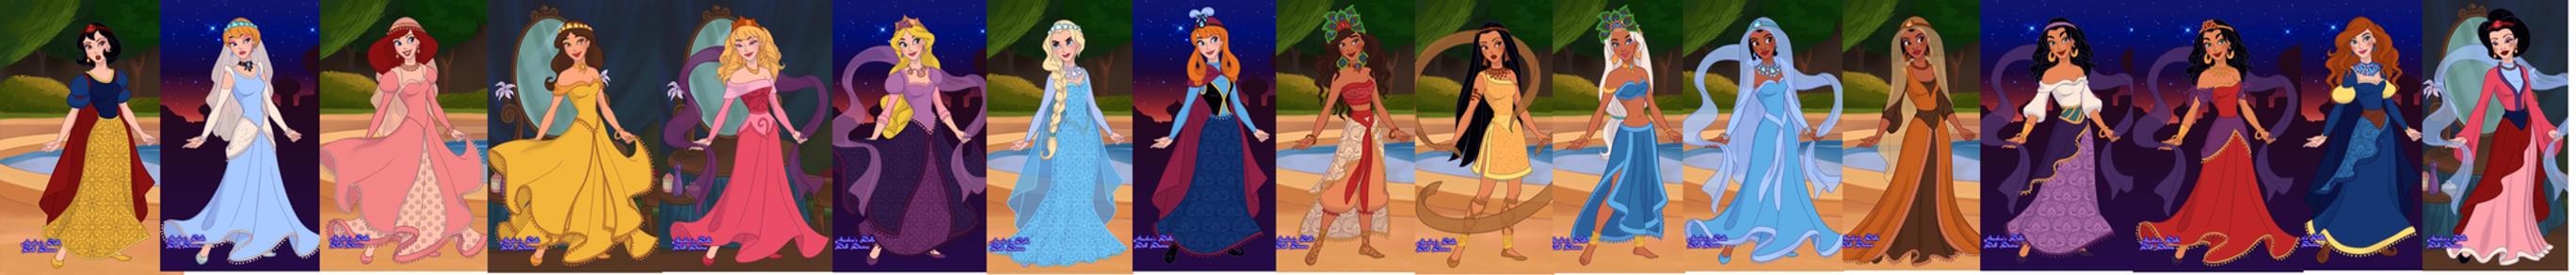 disney princesses Arabian style by adrianaTheGirlOnFire